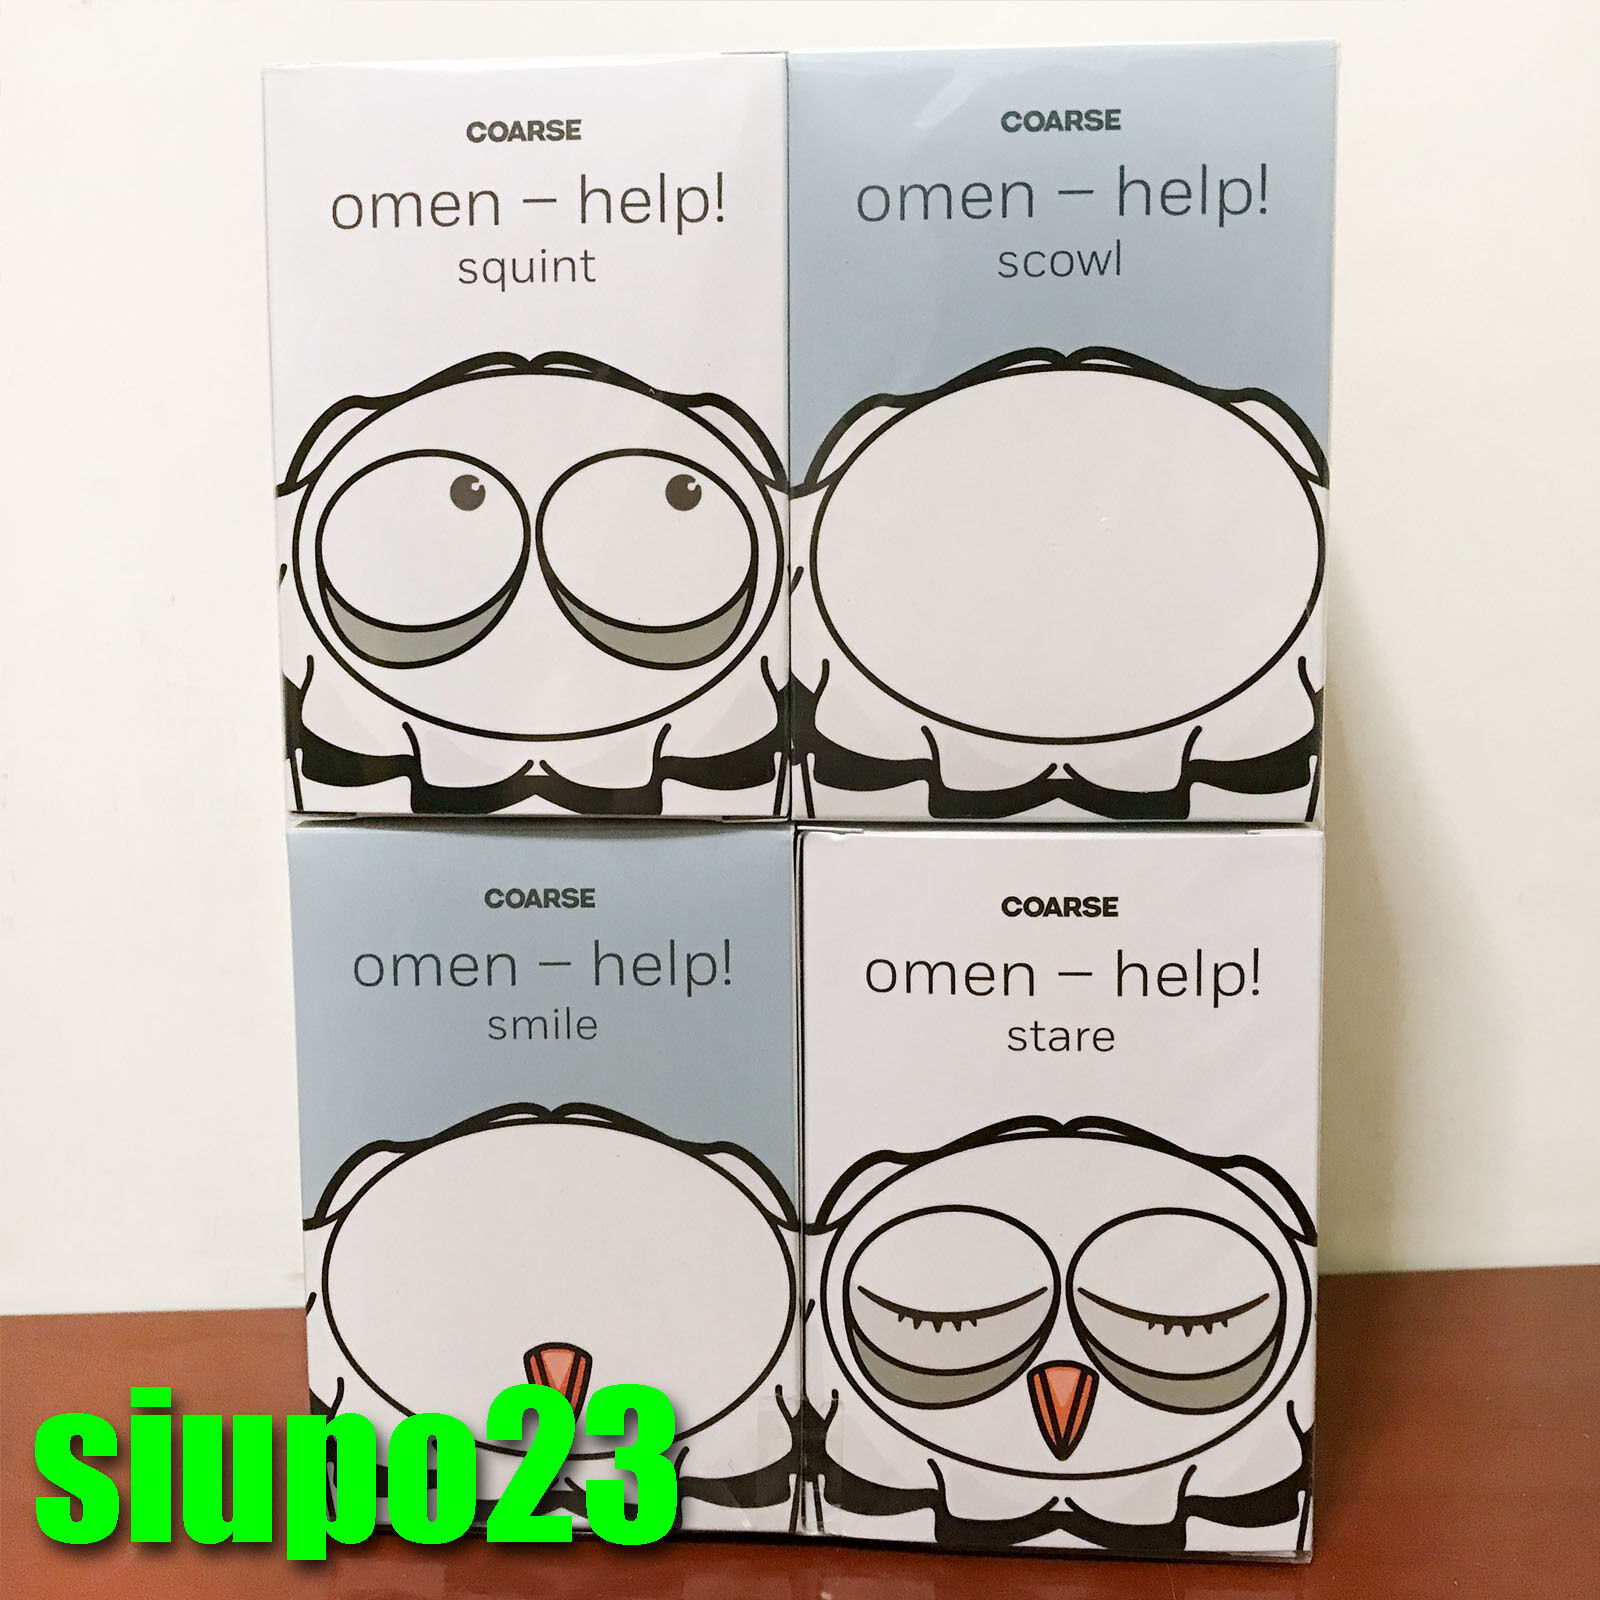 Coarse Coarsetoys ~ Omen help Squint, Scowl, Smile & Stare 3.5  Vinyl Figure 4p